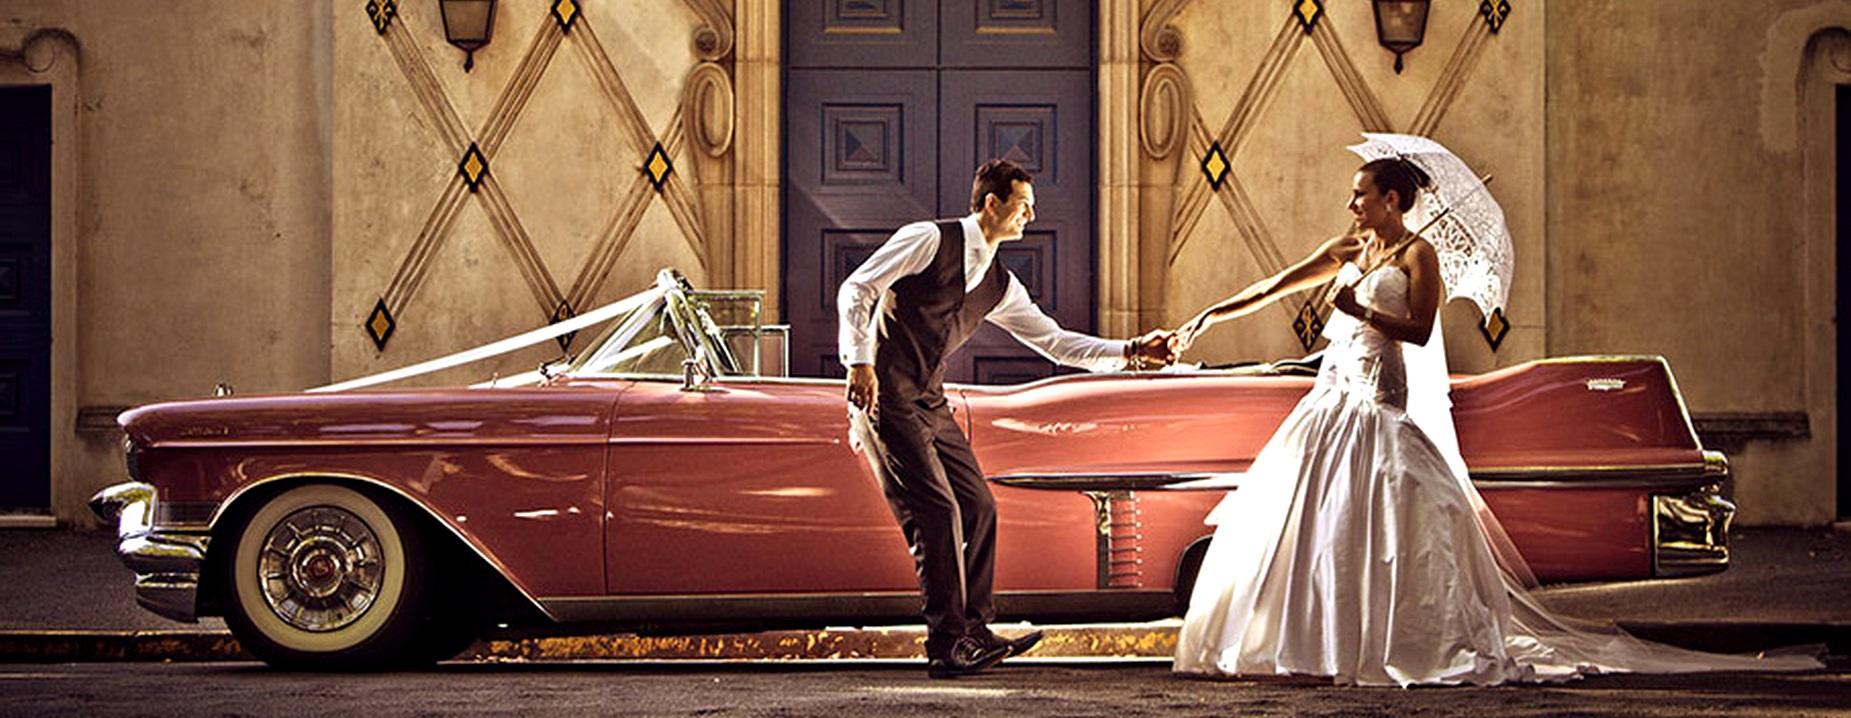 Rosa-Cadillac-som-bryllupsbil-til-bryllupskjøring